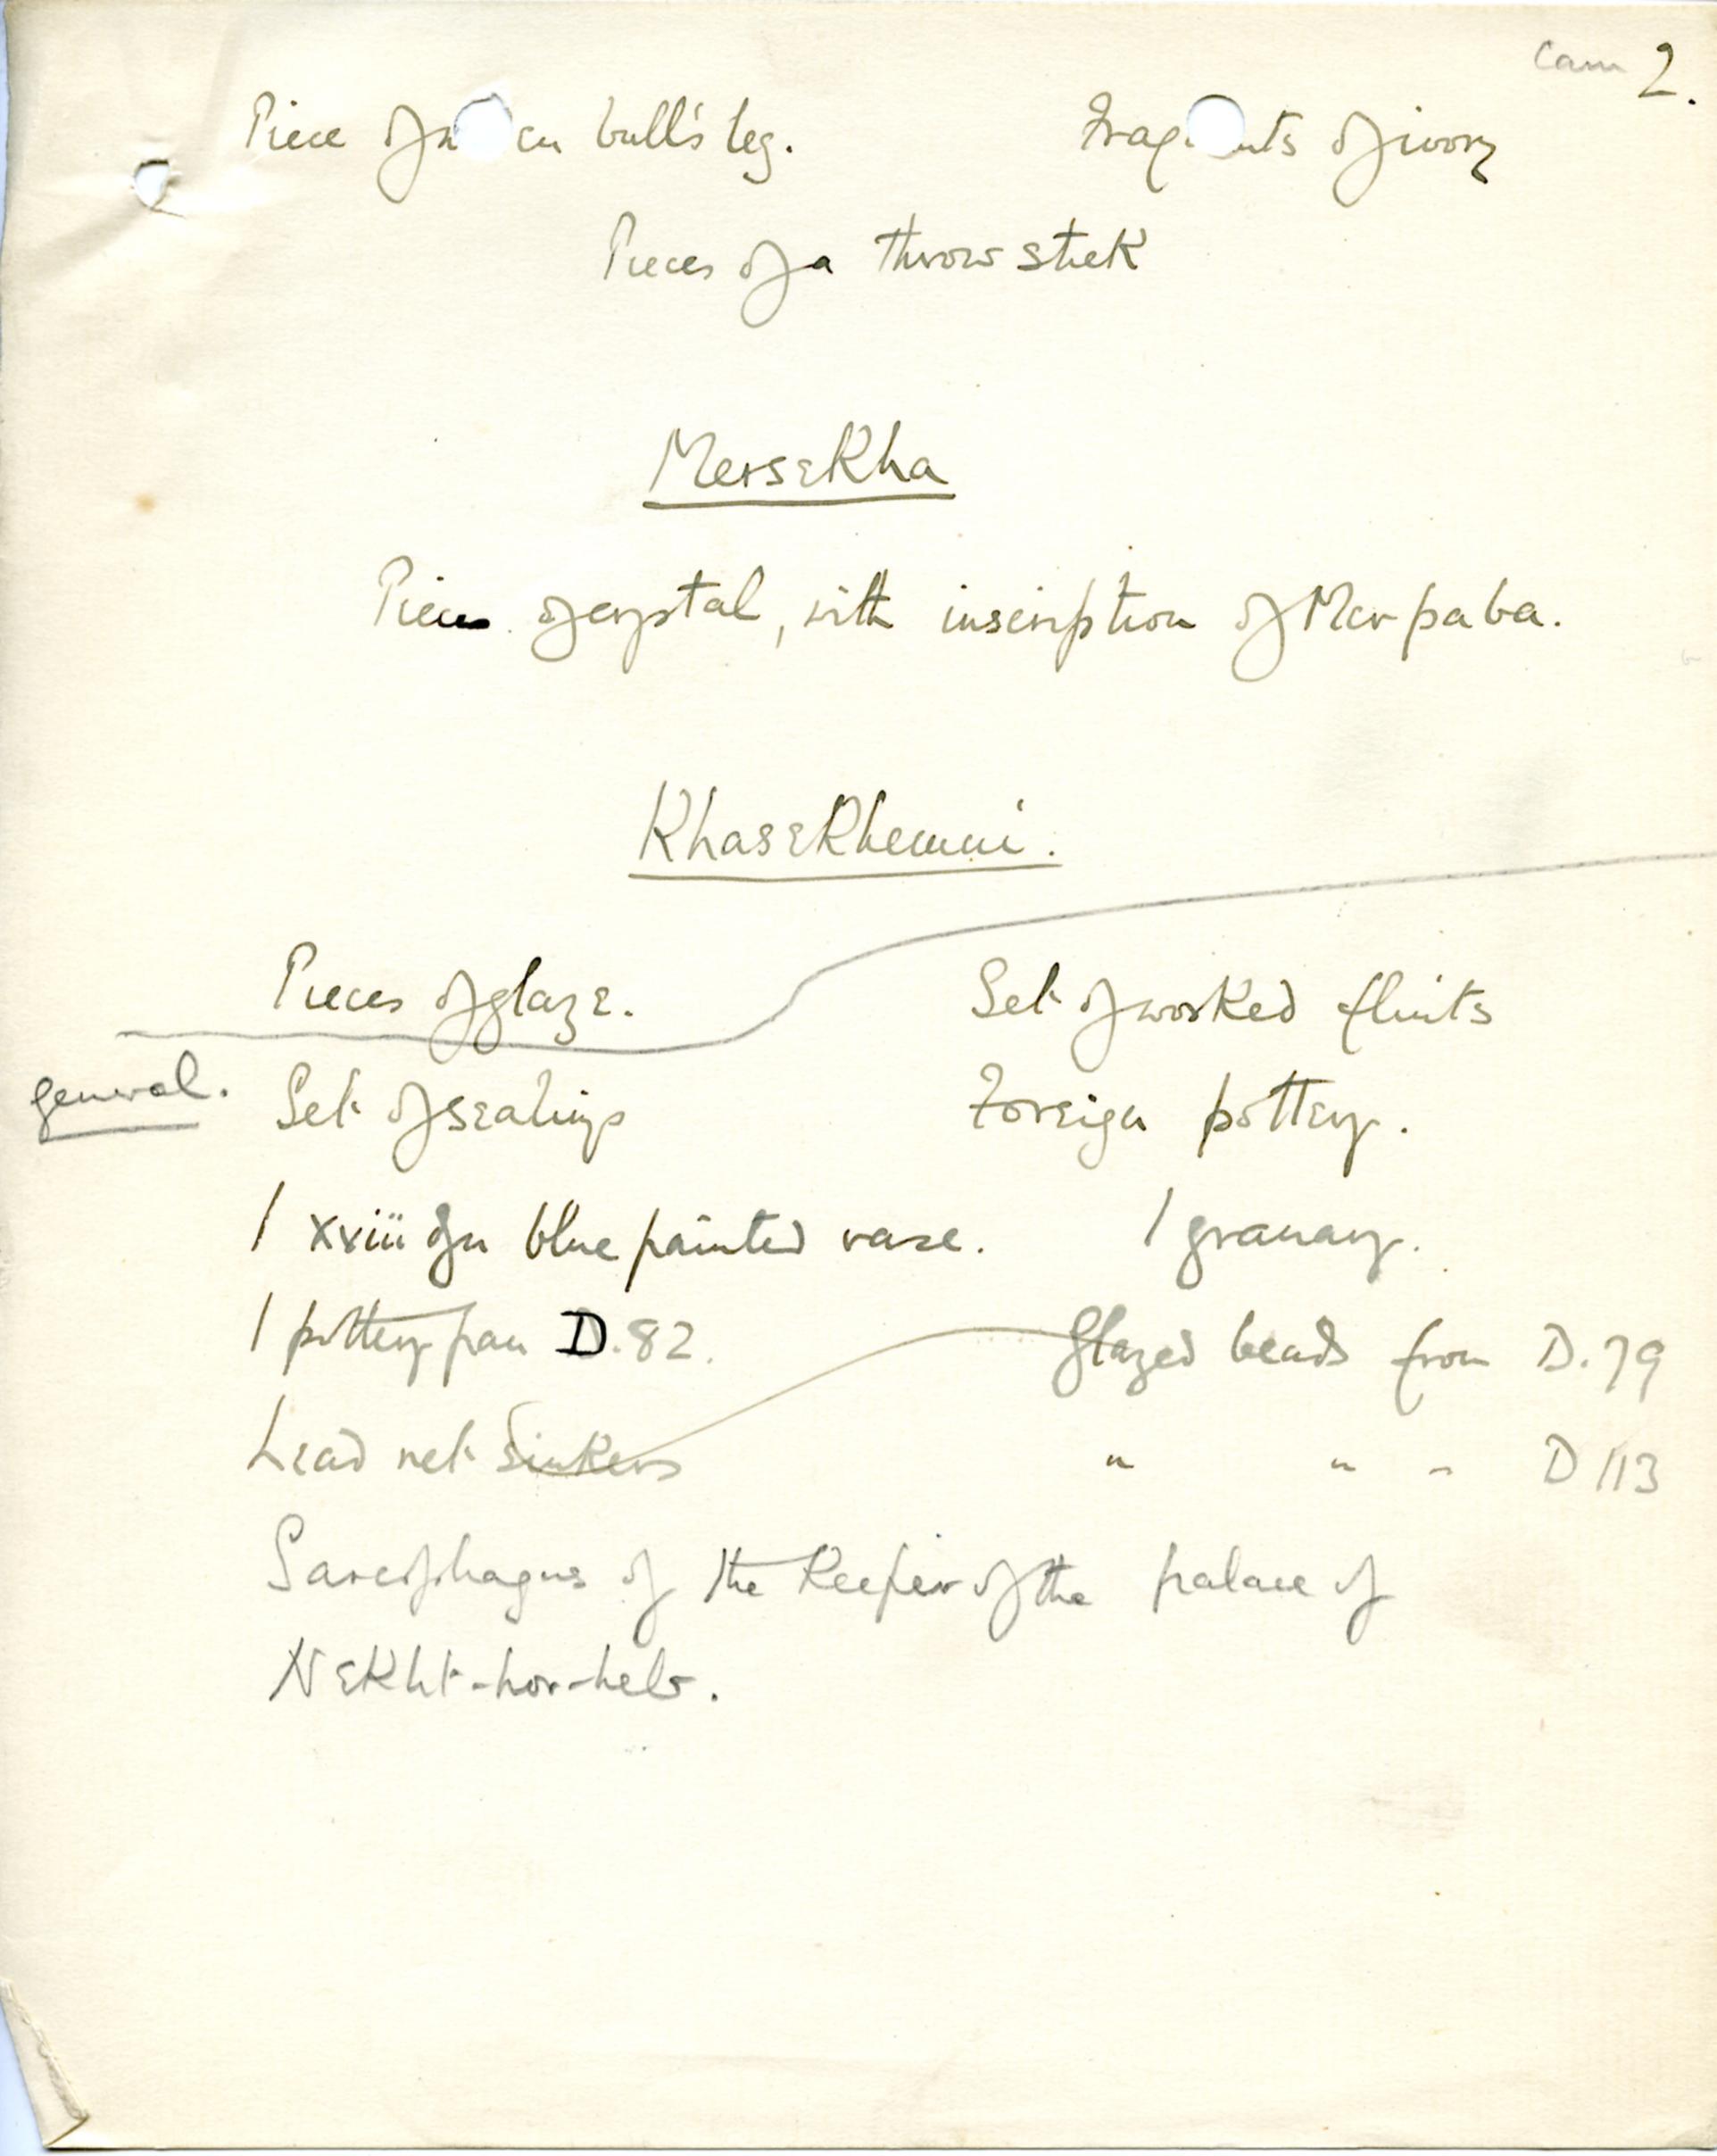 1898-1899 Hu, 1899-1900 Abydos DIST.17.62b